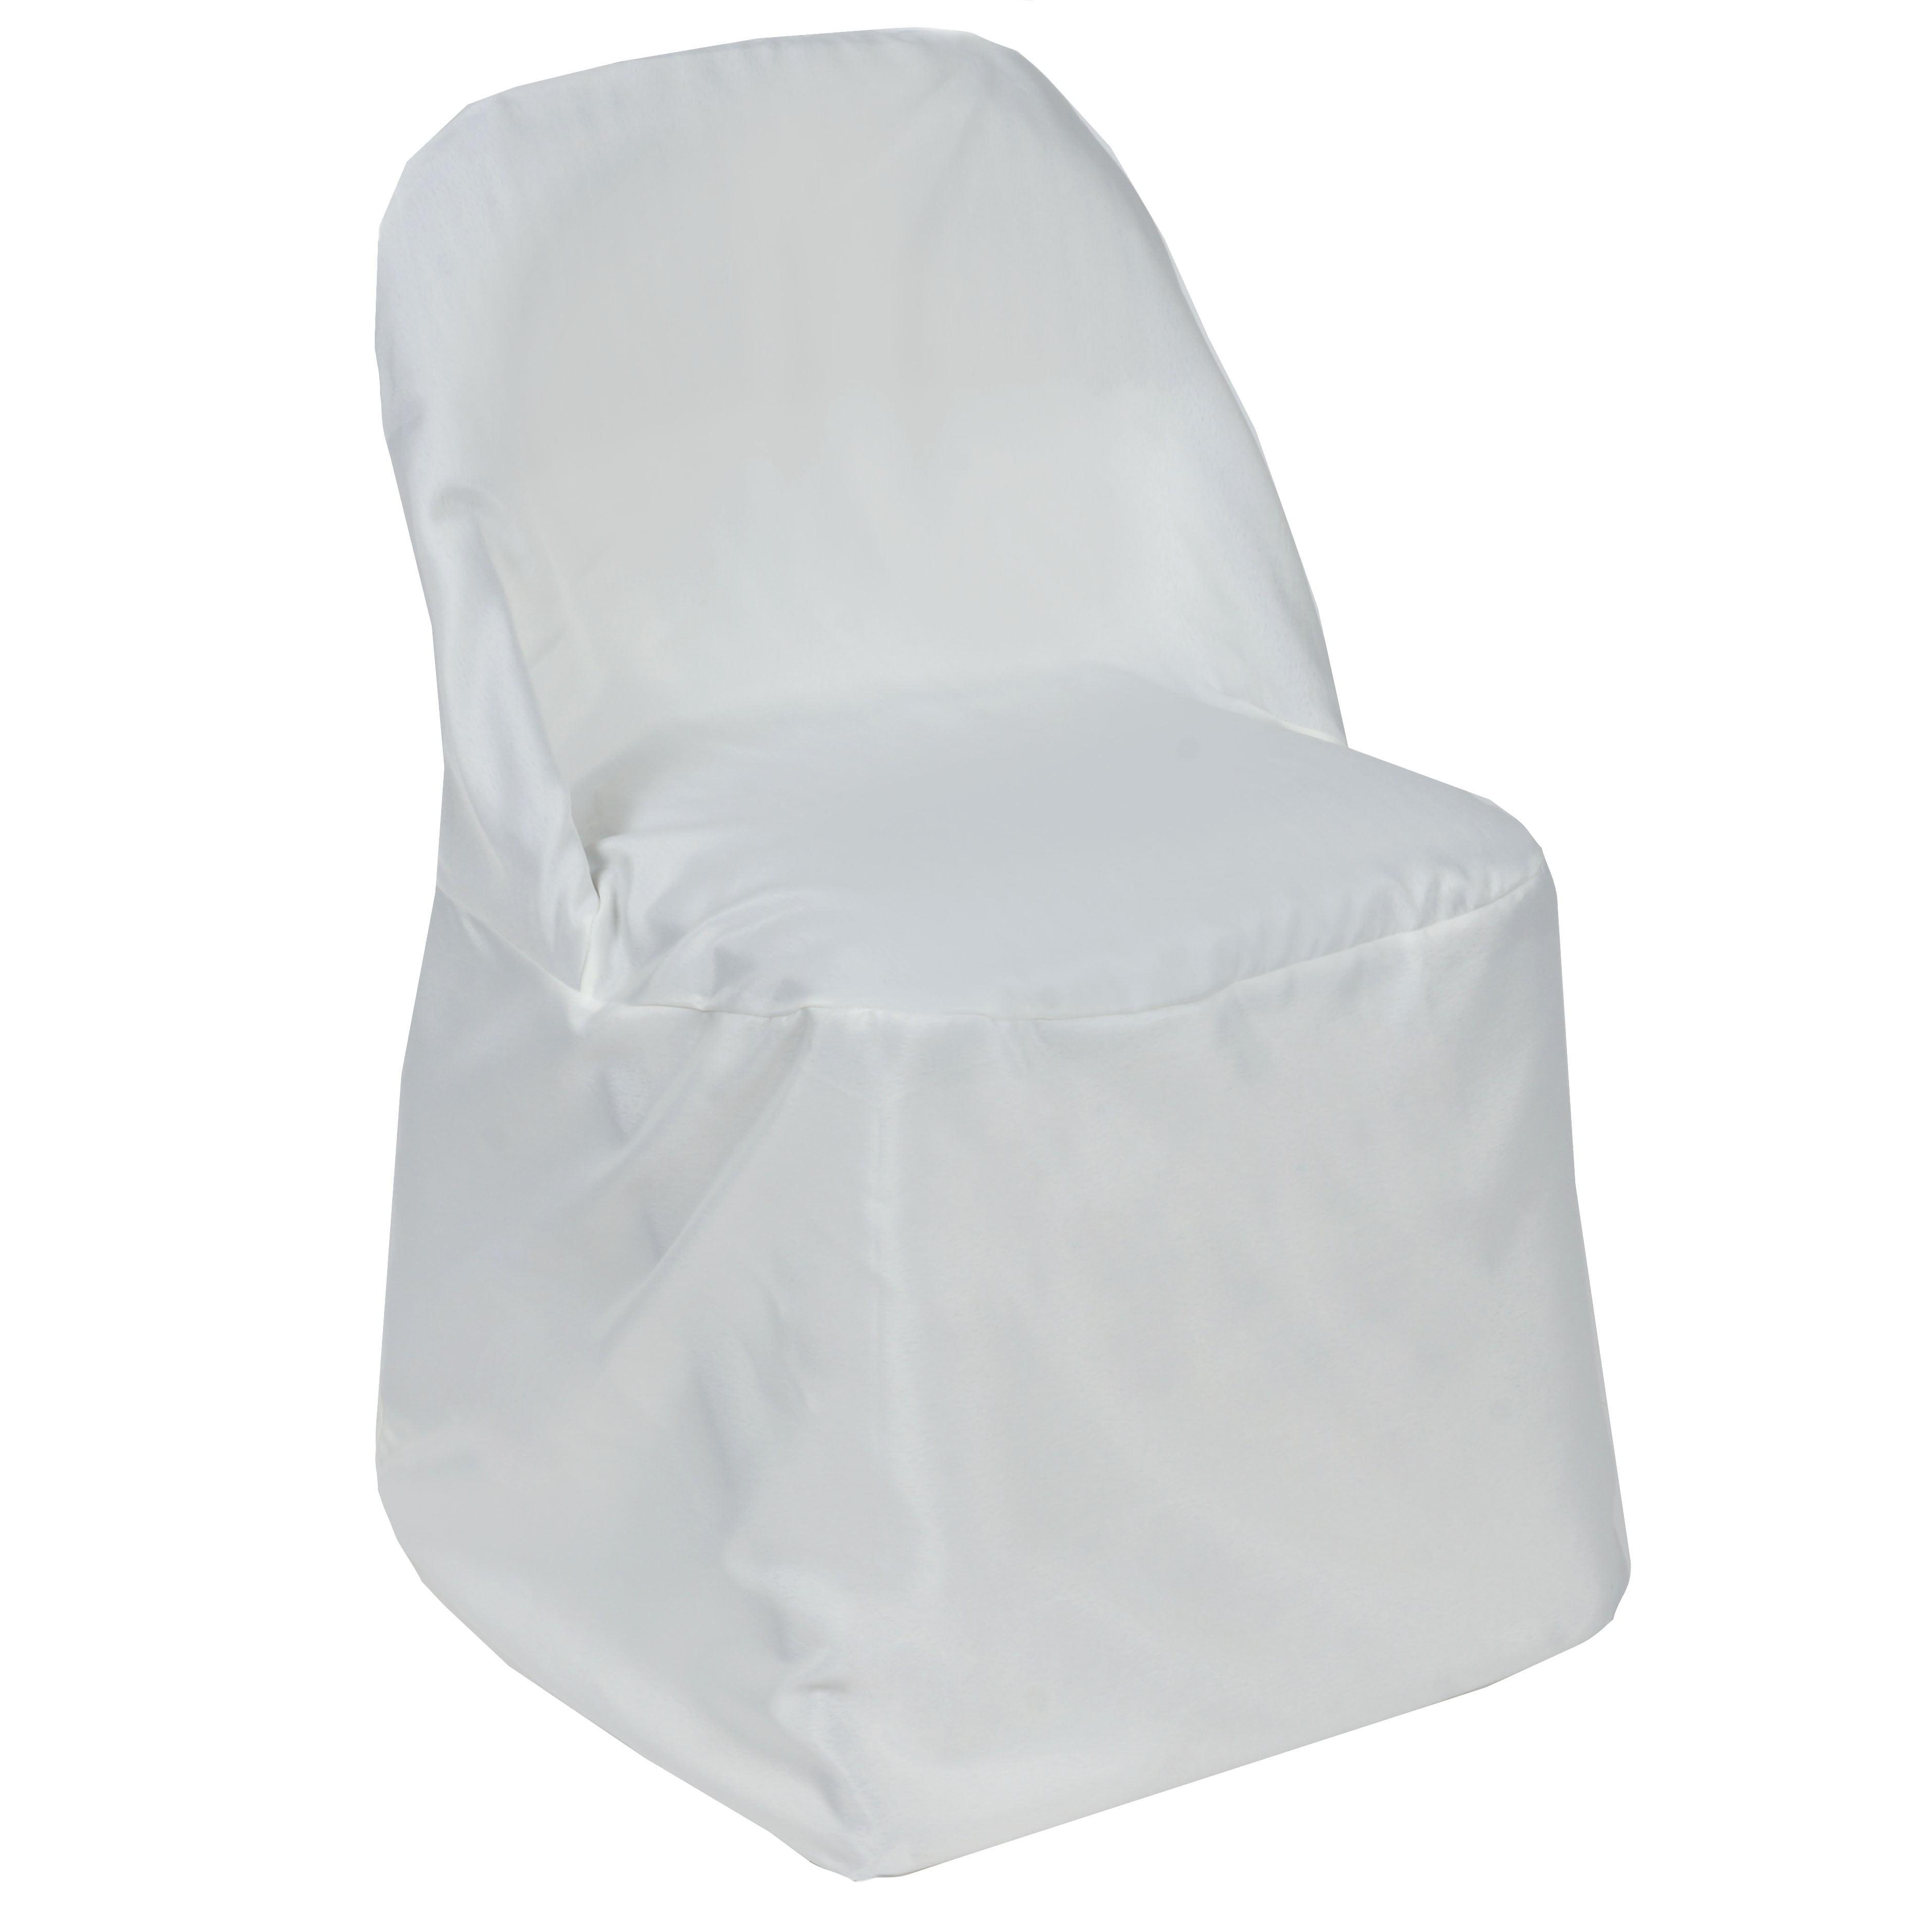 BalsaCircle Folding Round Polyester Wedding Chair Cover Walmart